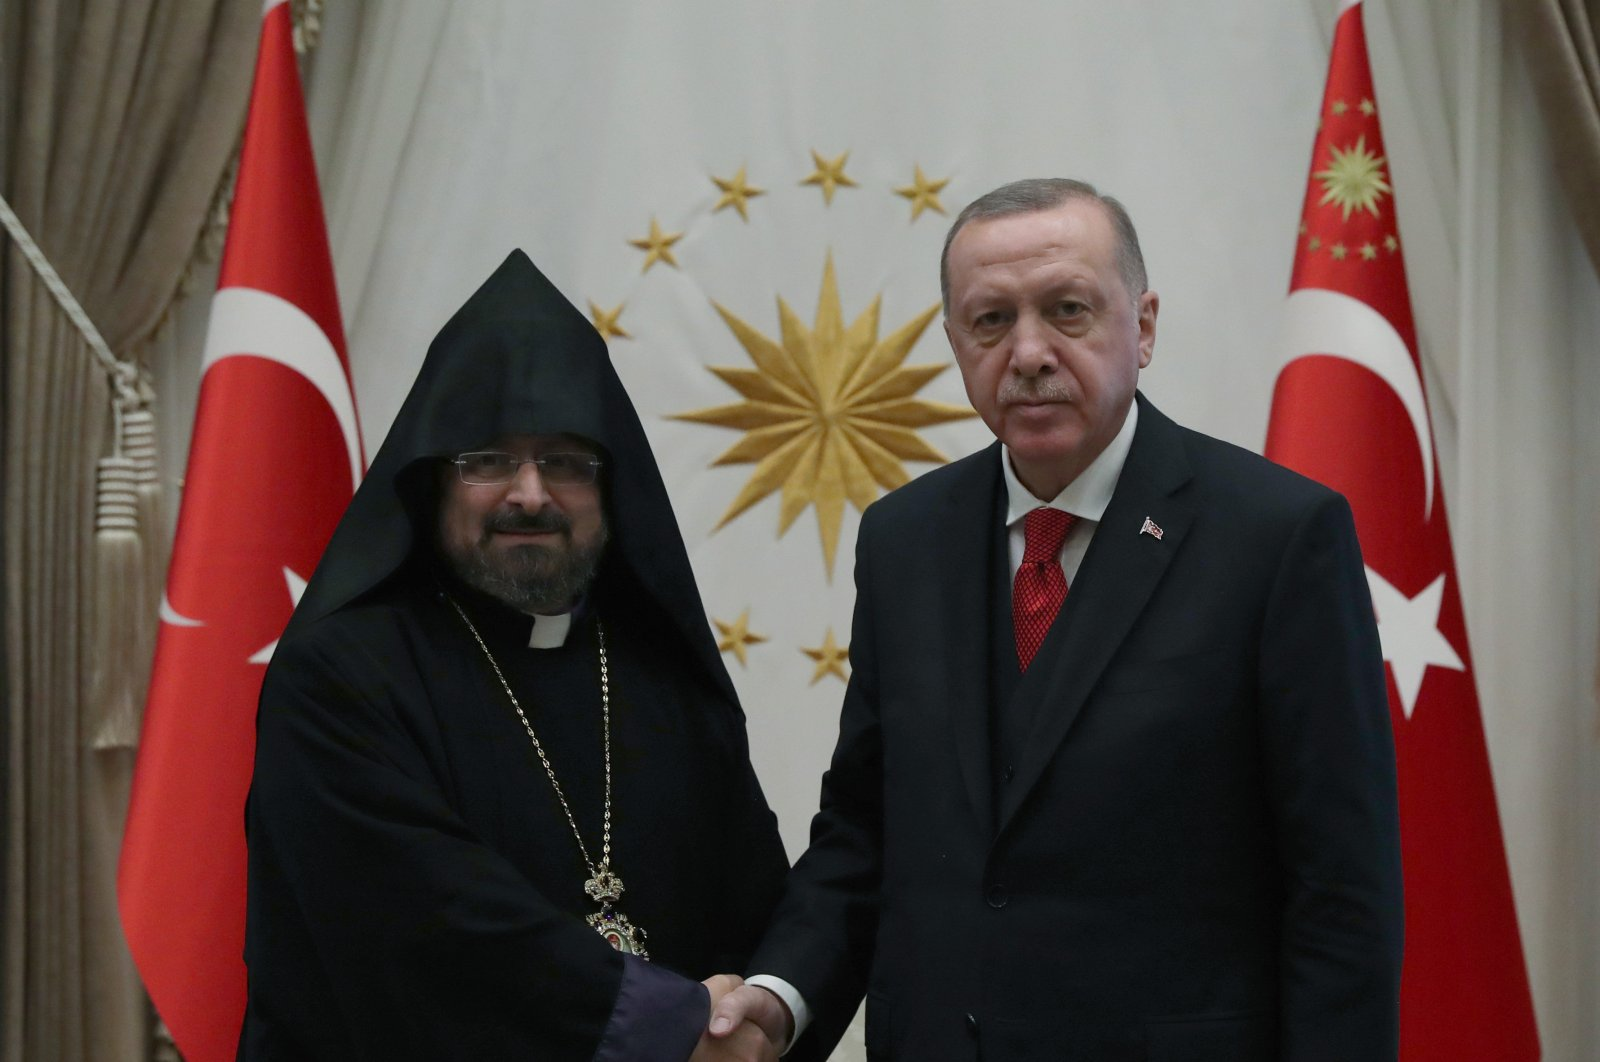 President Recep Tayyip Erdoğan (right) shakes hands with Armenian Patriarch Sahak Maşalyan at the Presidential Complex in Ankara on January 15, 2020 (AA File Photo)